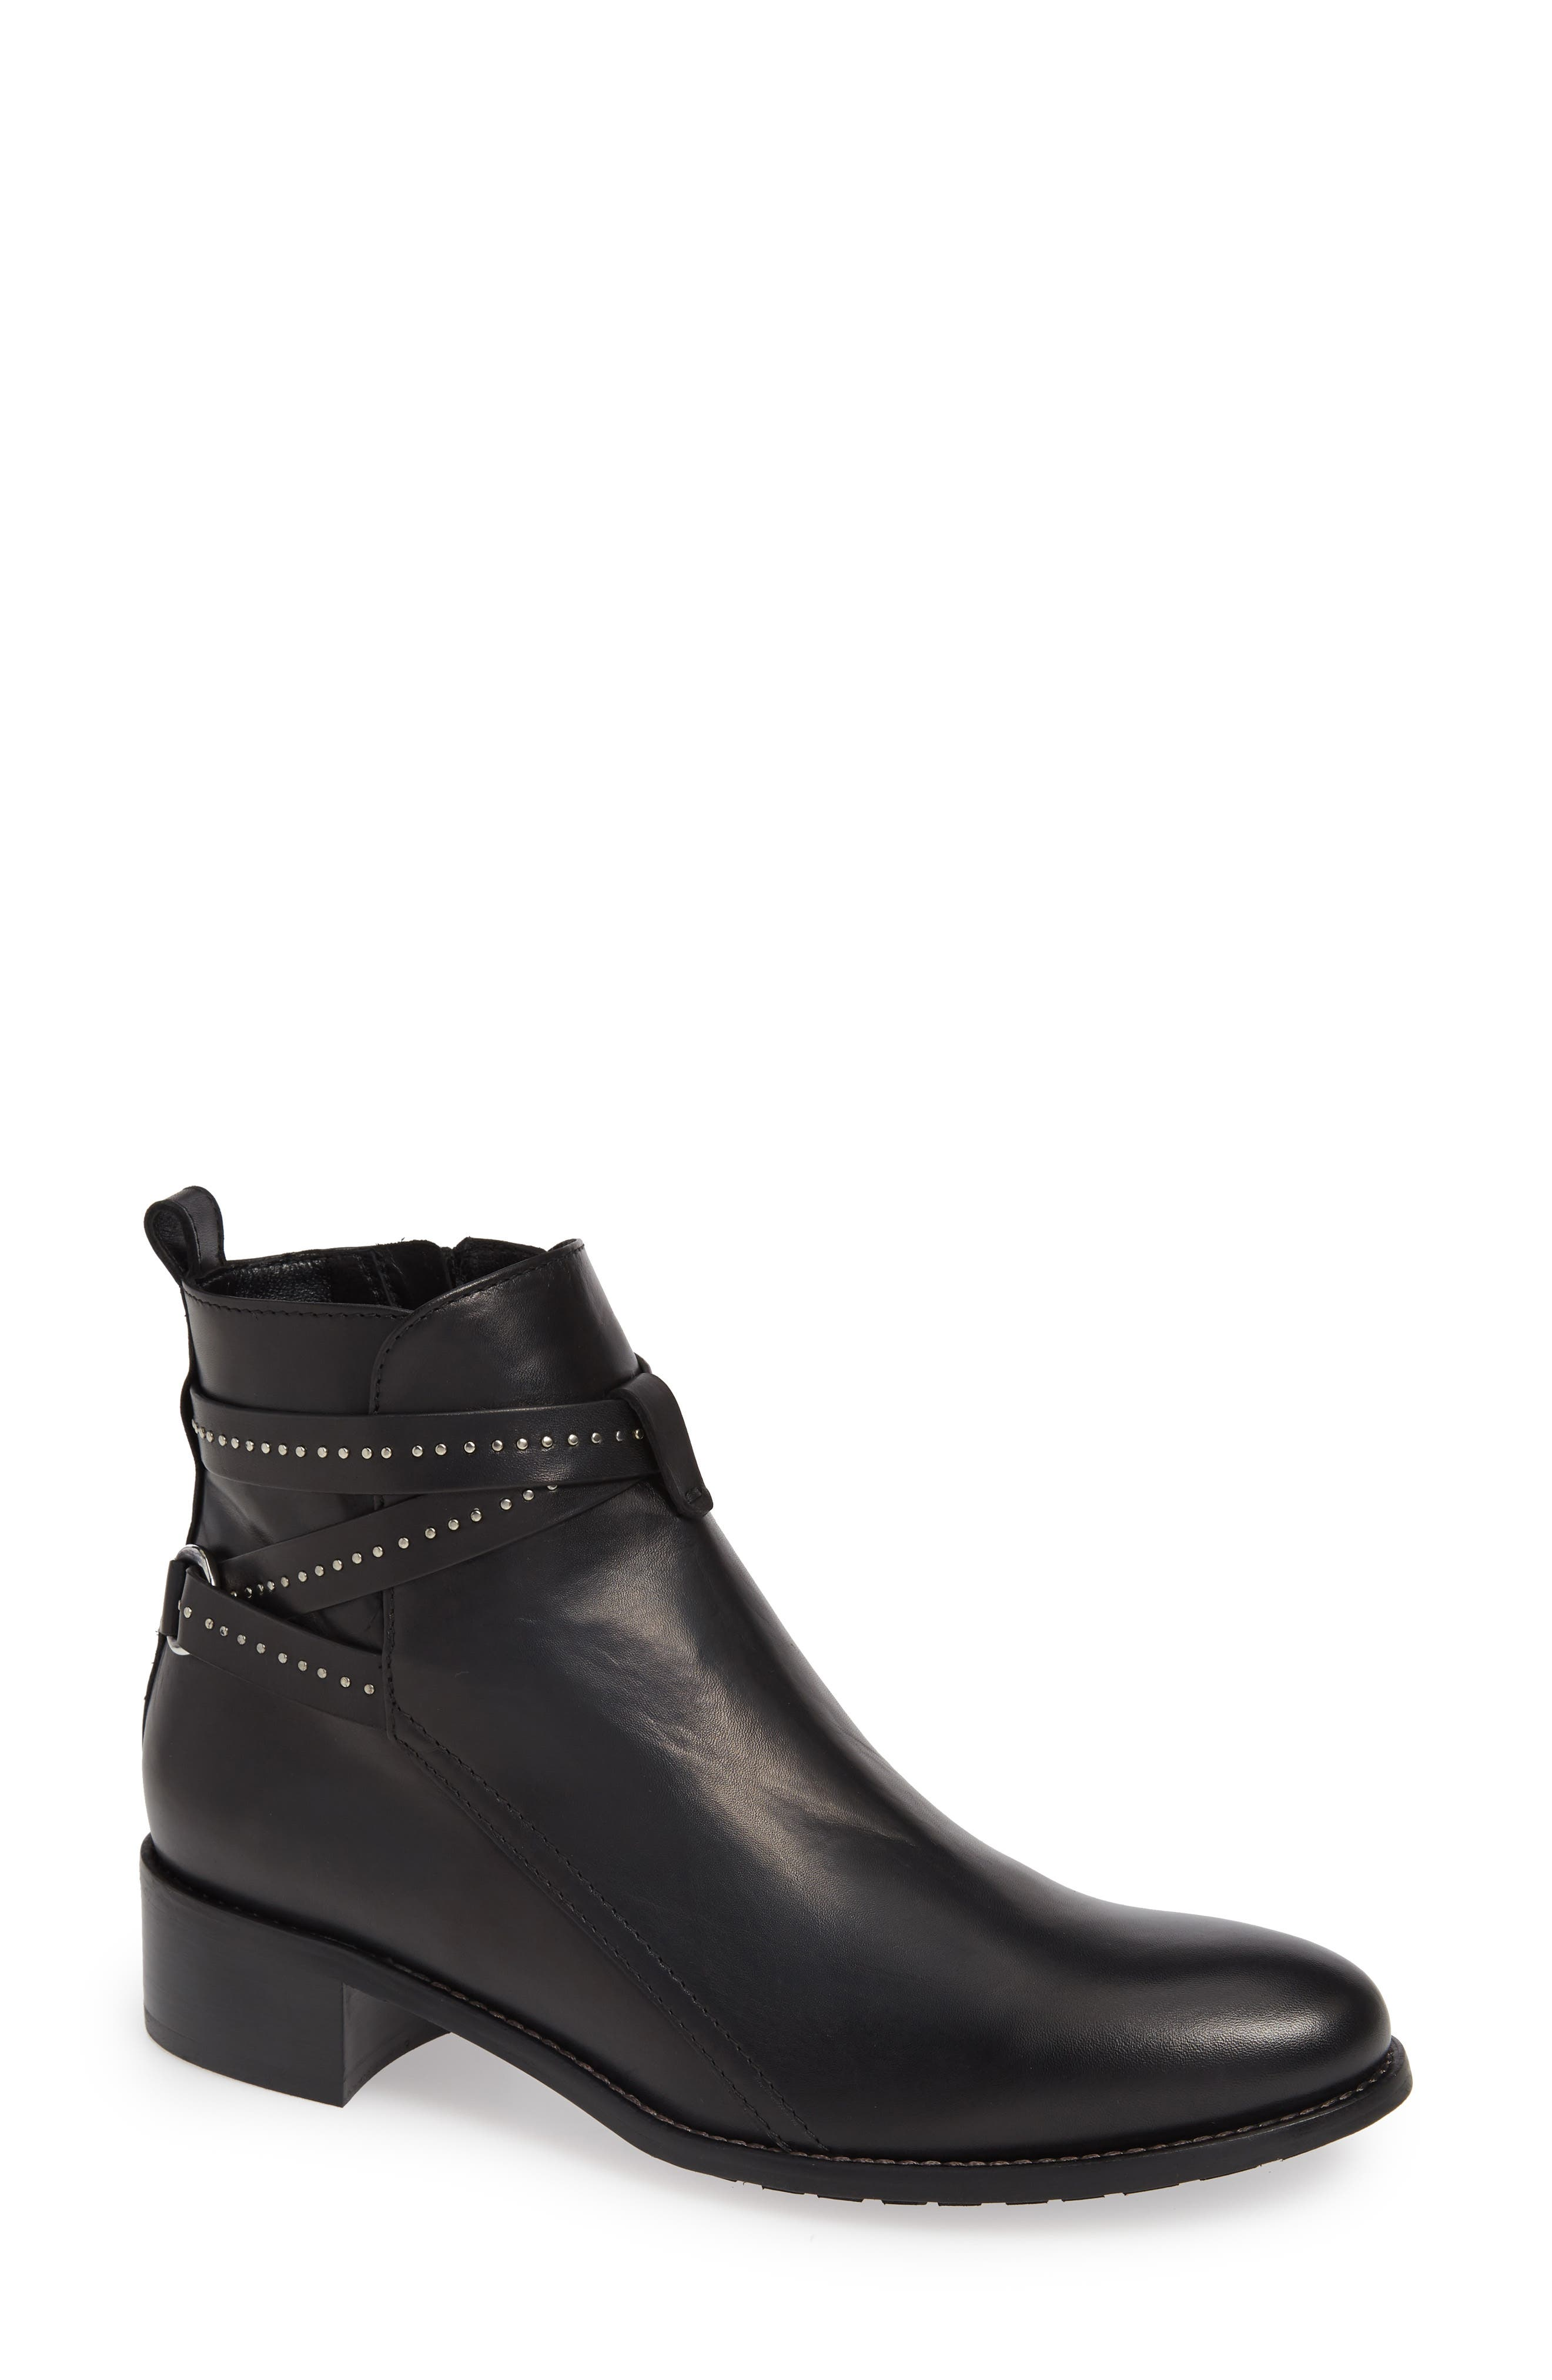 Aquatalia Odema Weatherproof Boot, Black